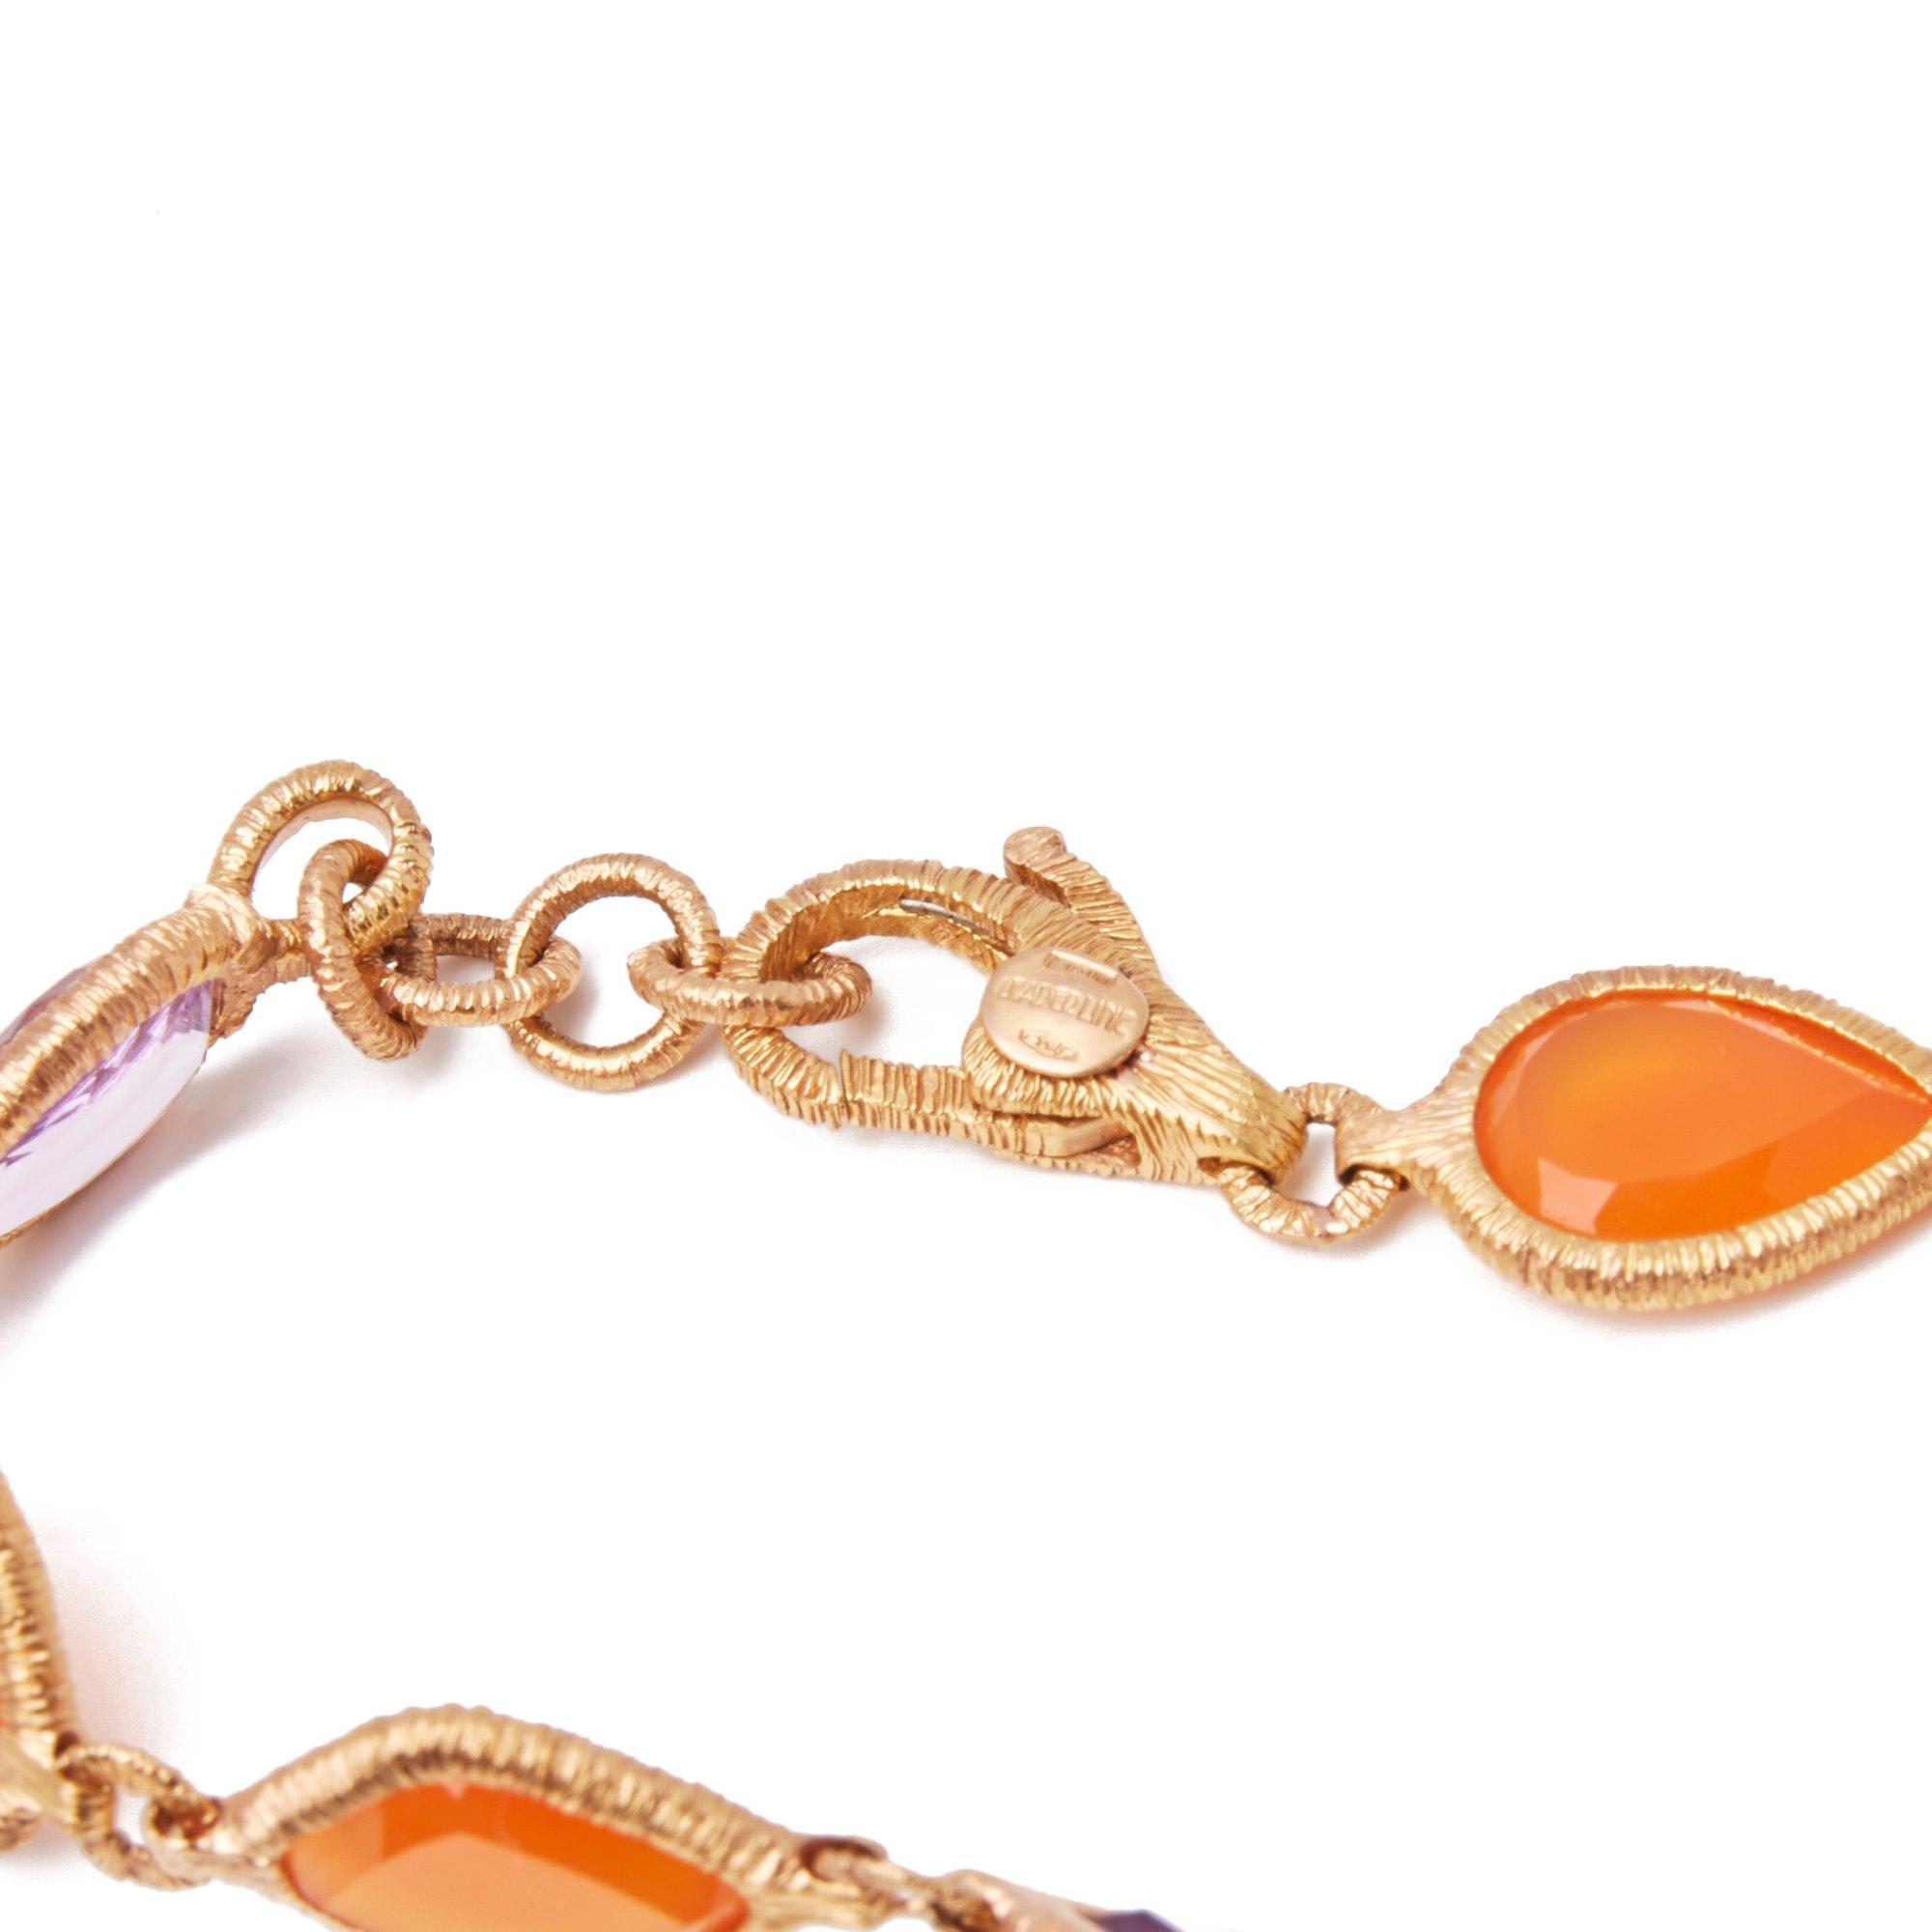 Amethyst 18k Yellow Gold Carnelian and Amethyst Bracelet